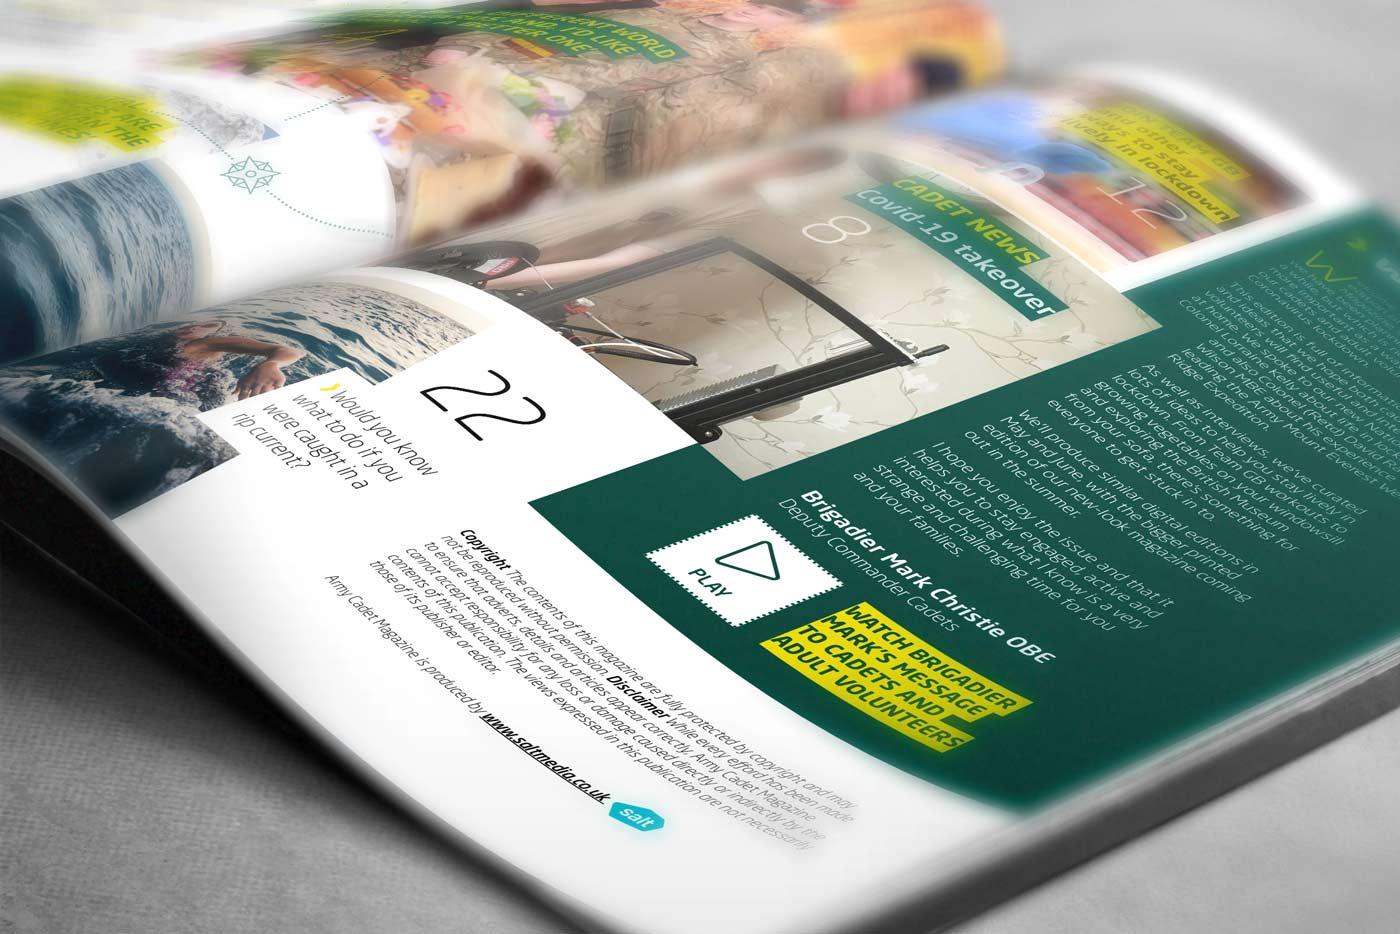 cadet magazine digital edition